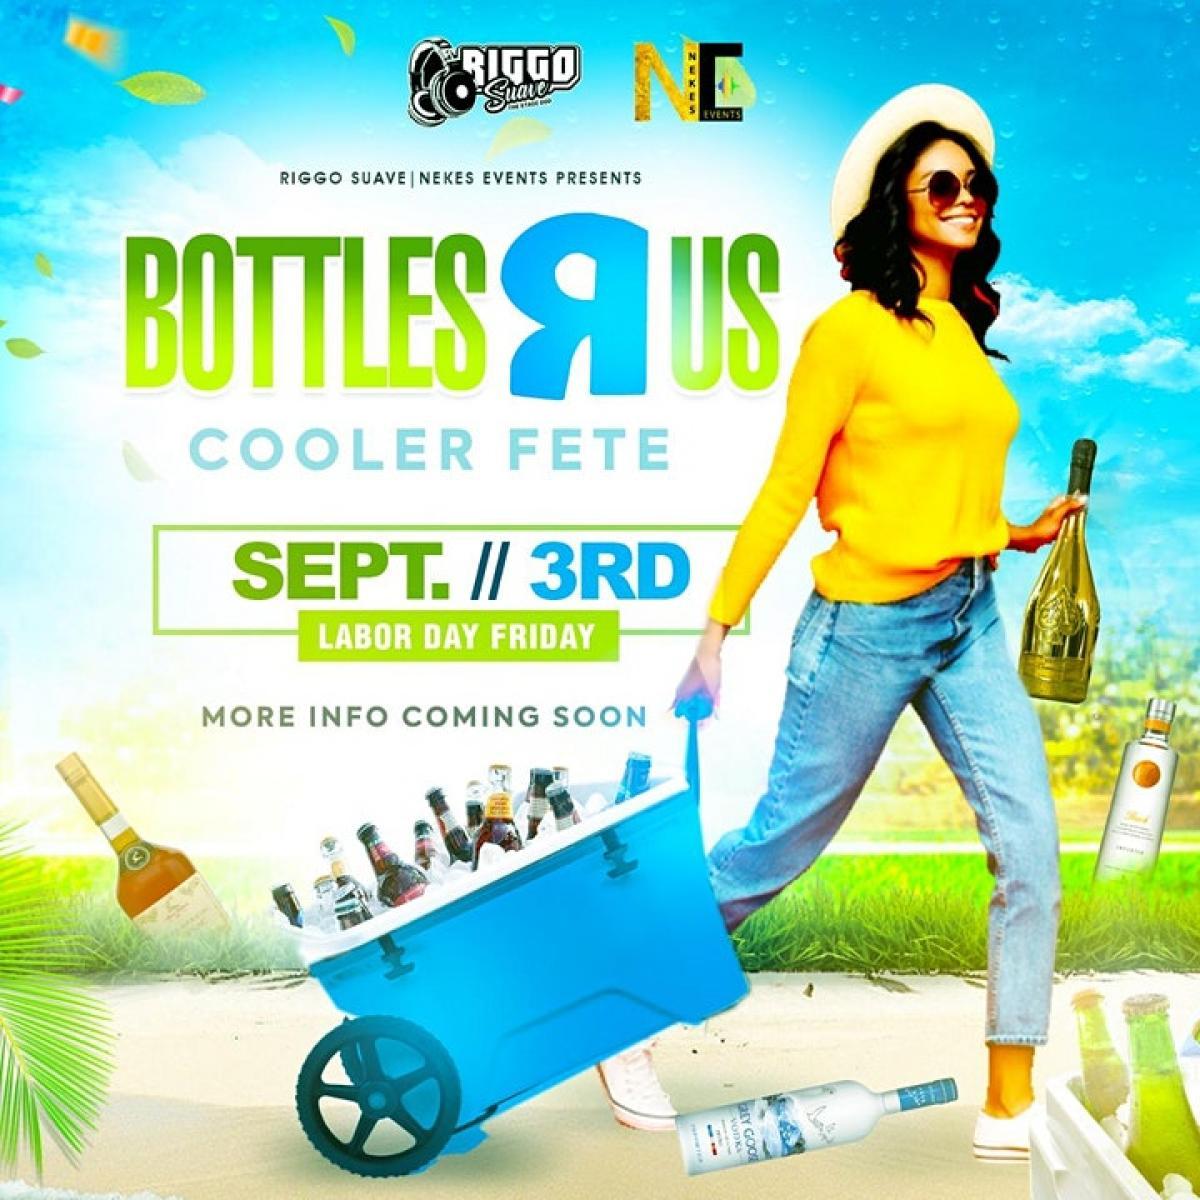 Bottles R Us flyer or graphic.